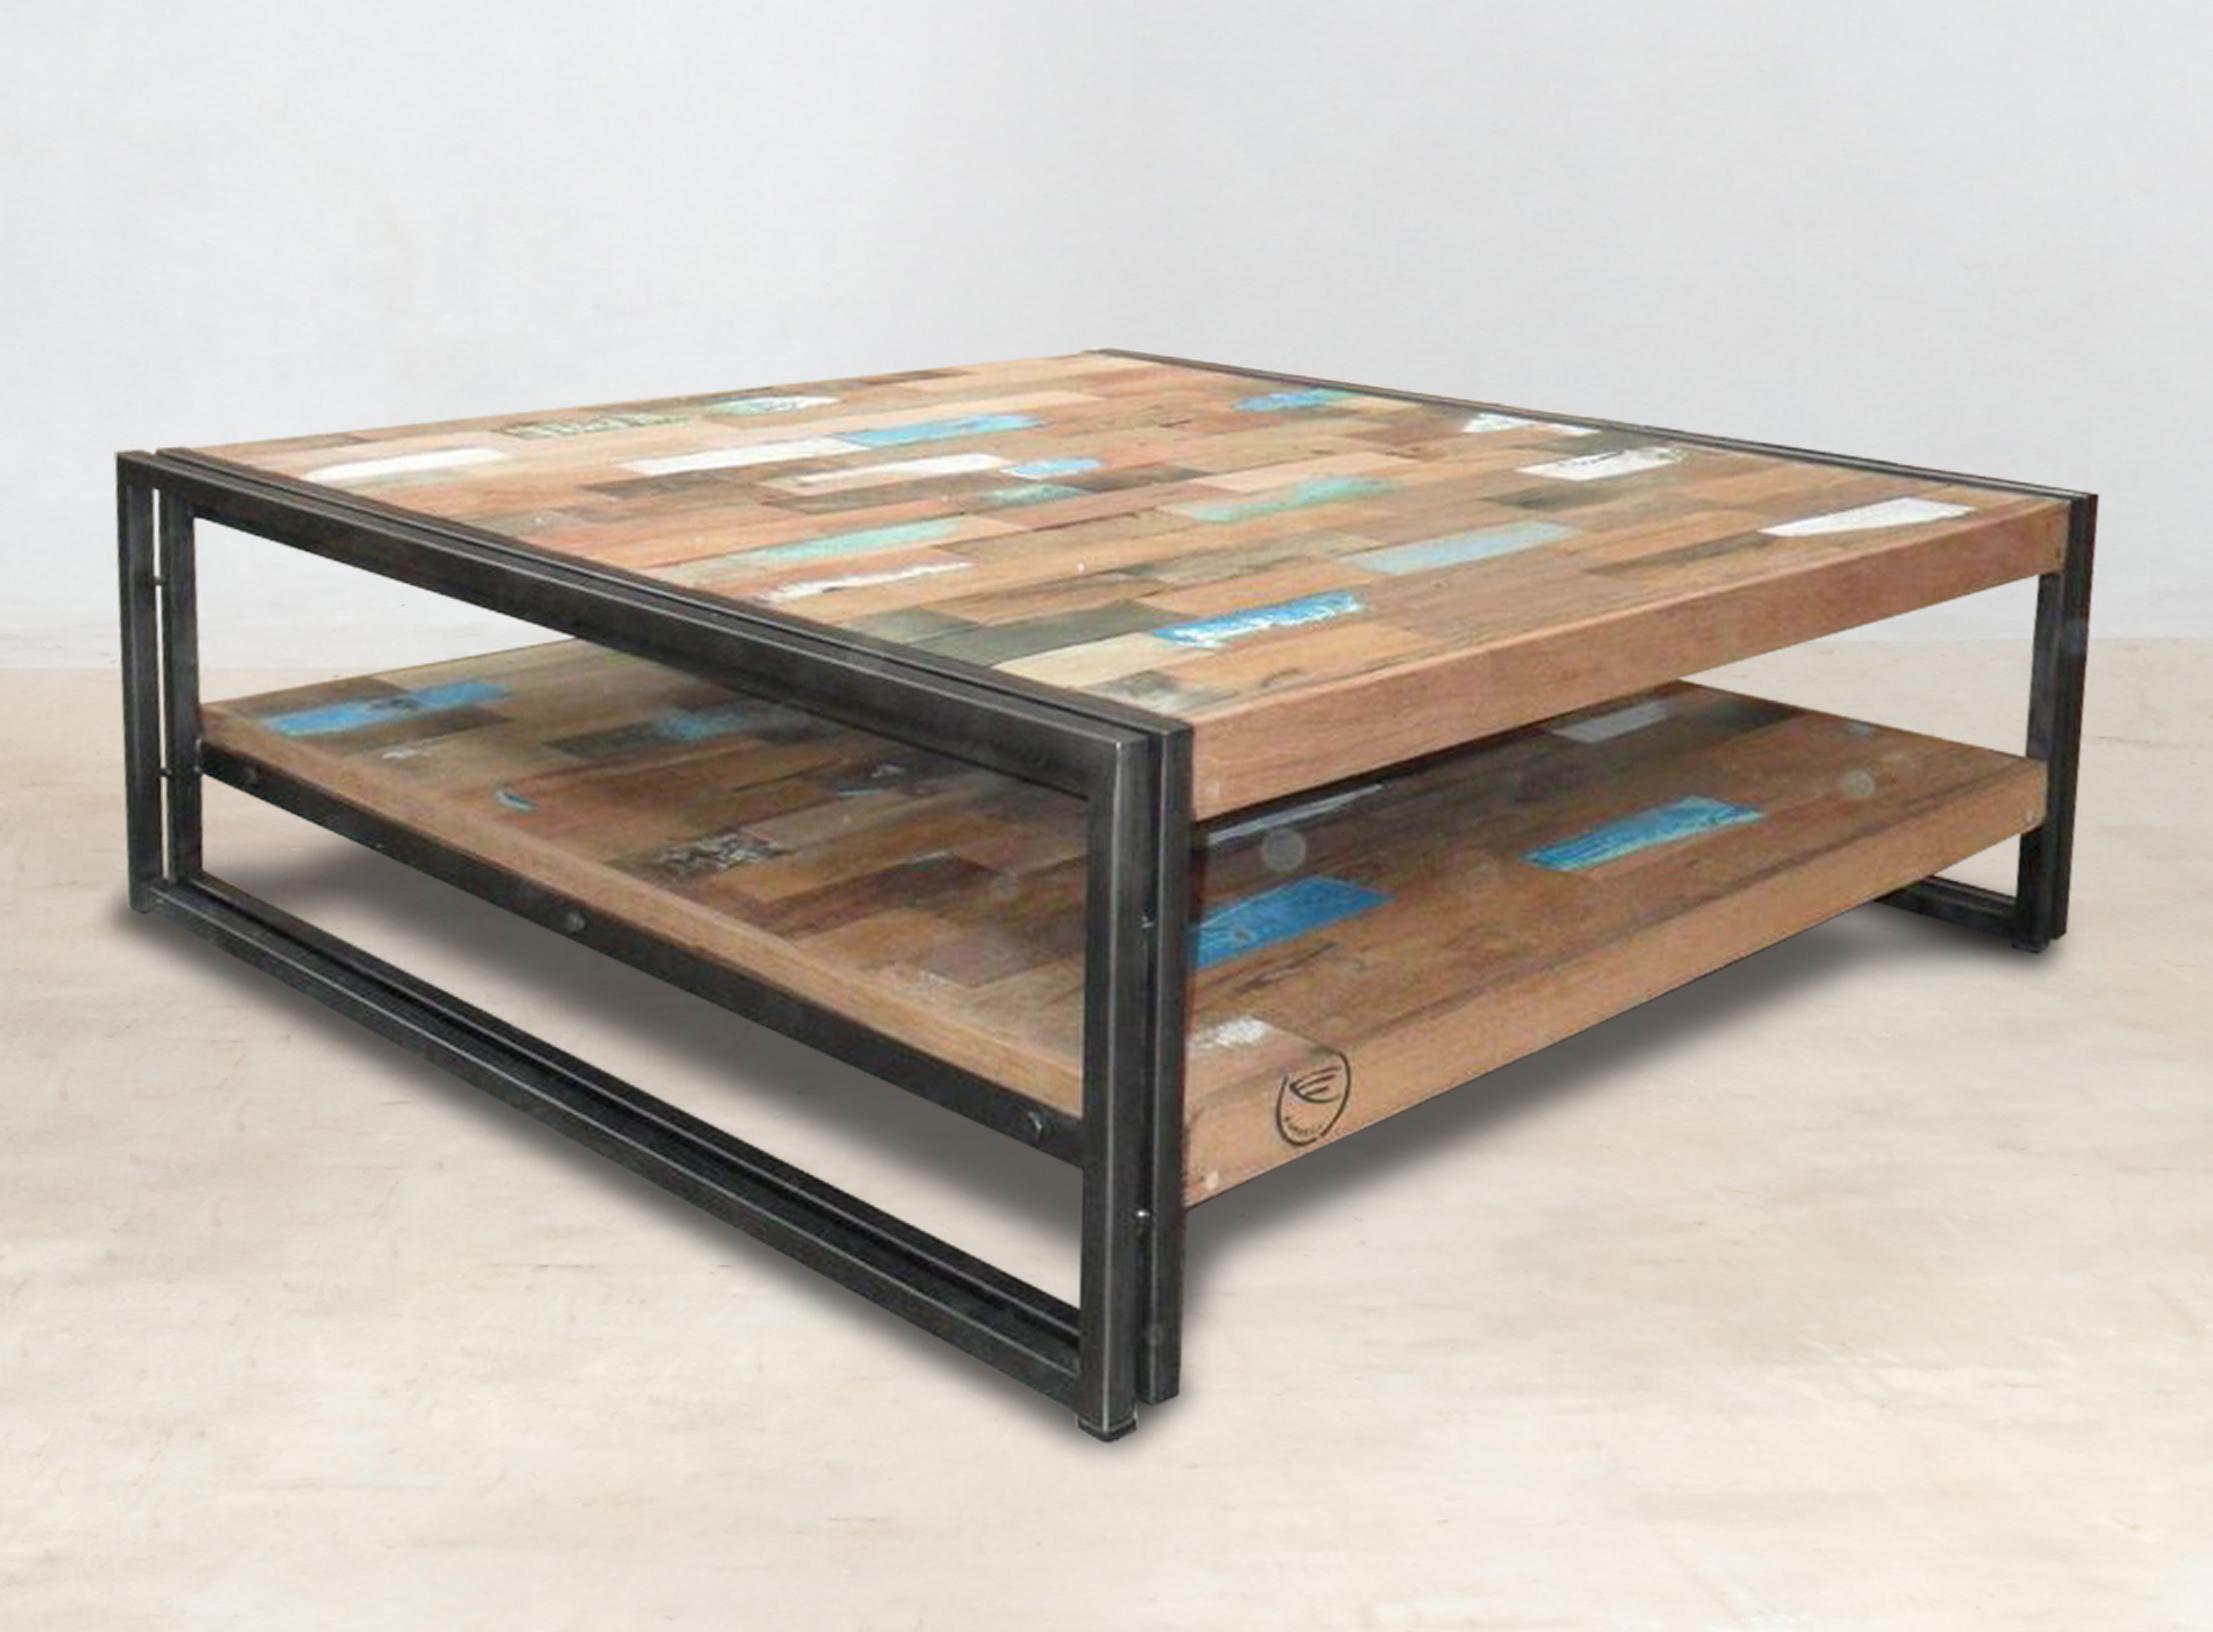 Table Basse Carree Bois Recycle Double Plateaux 100x100 Caravelle